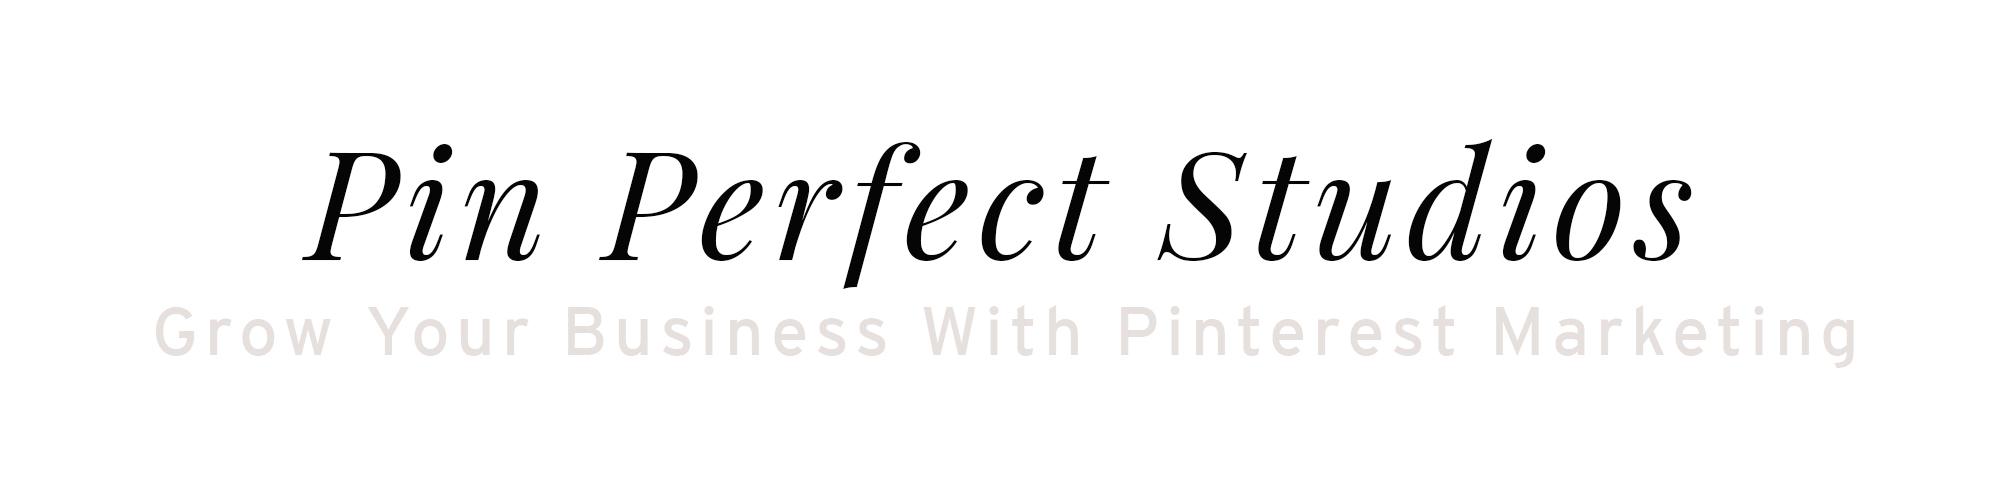 Pin Perfect Studios Courses